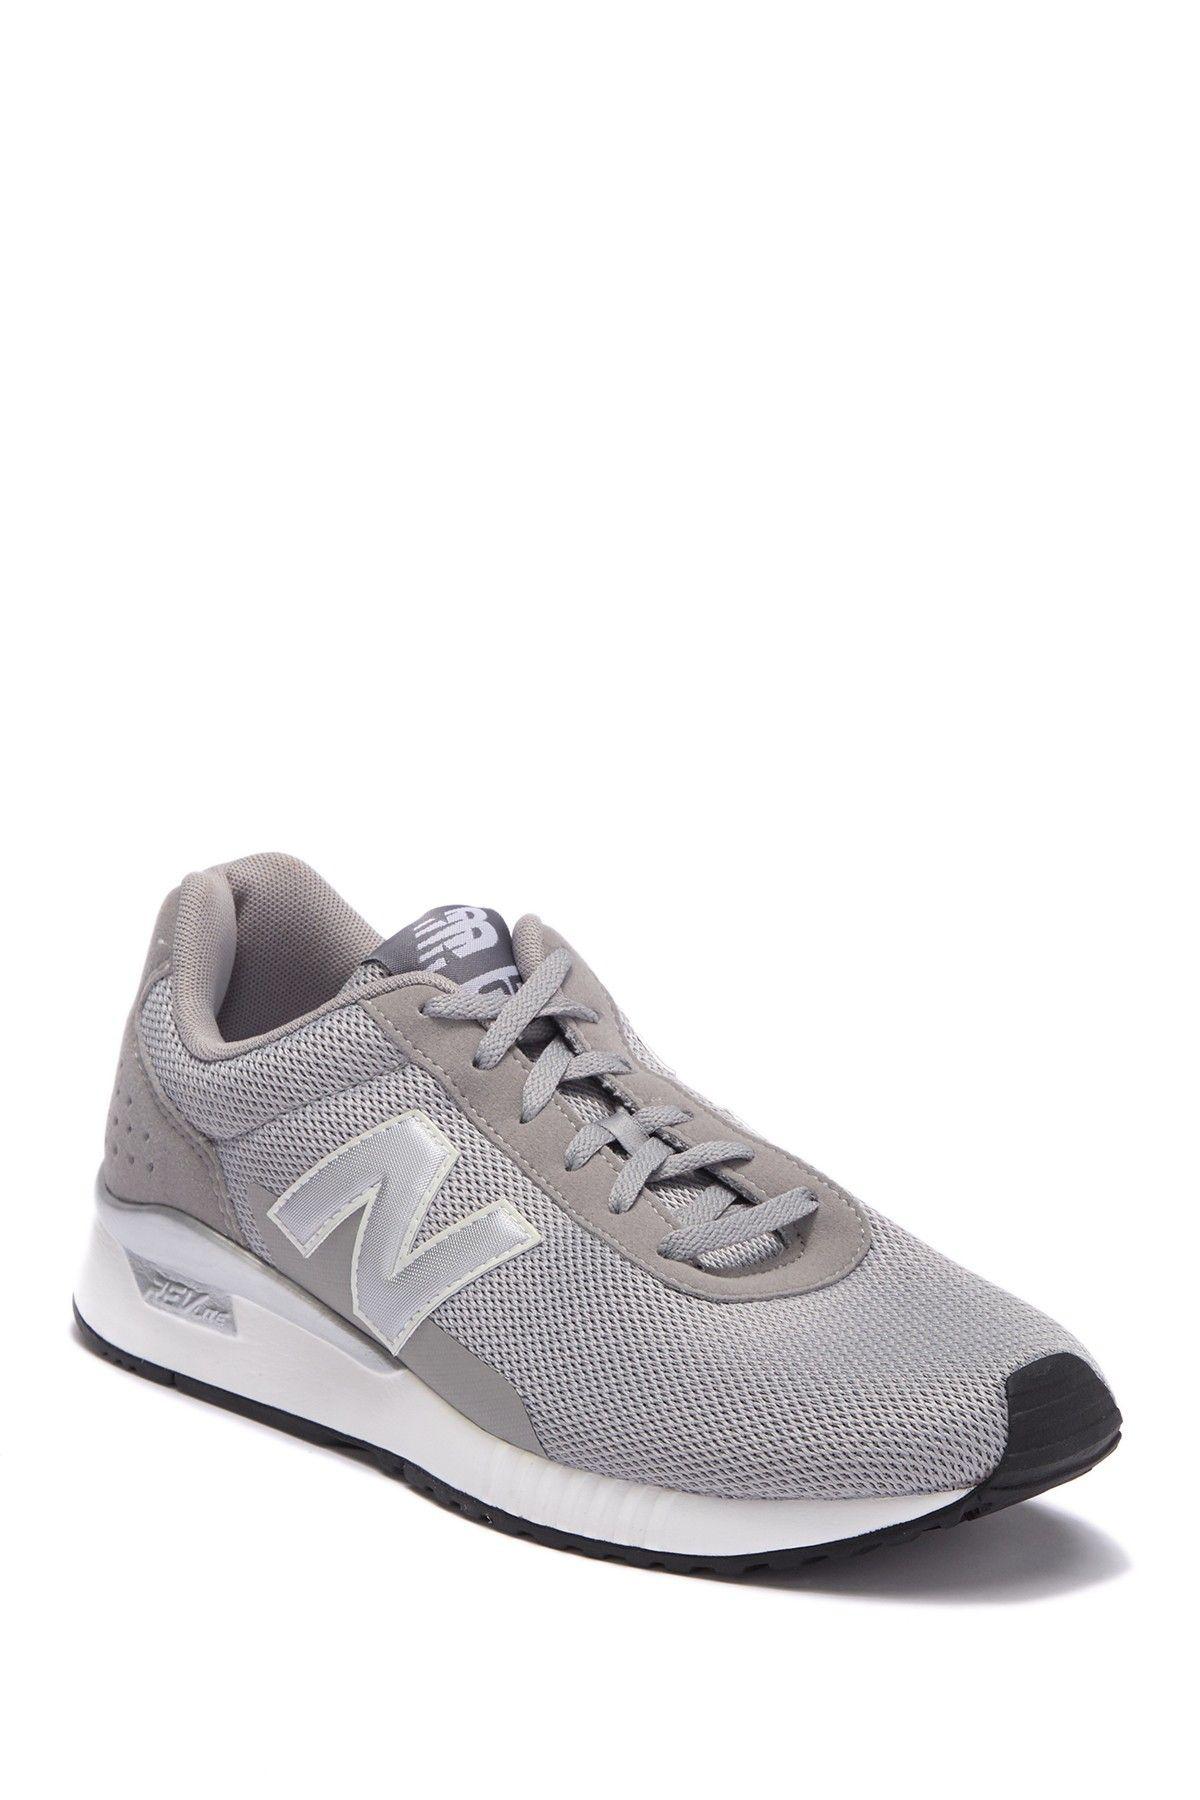 005 Running Sneaker In Grey Running sneakers, New